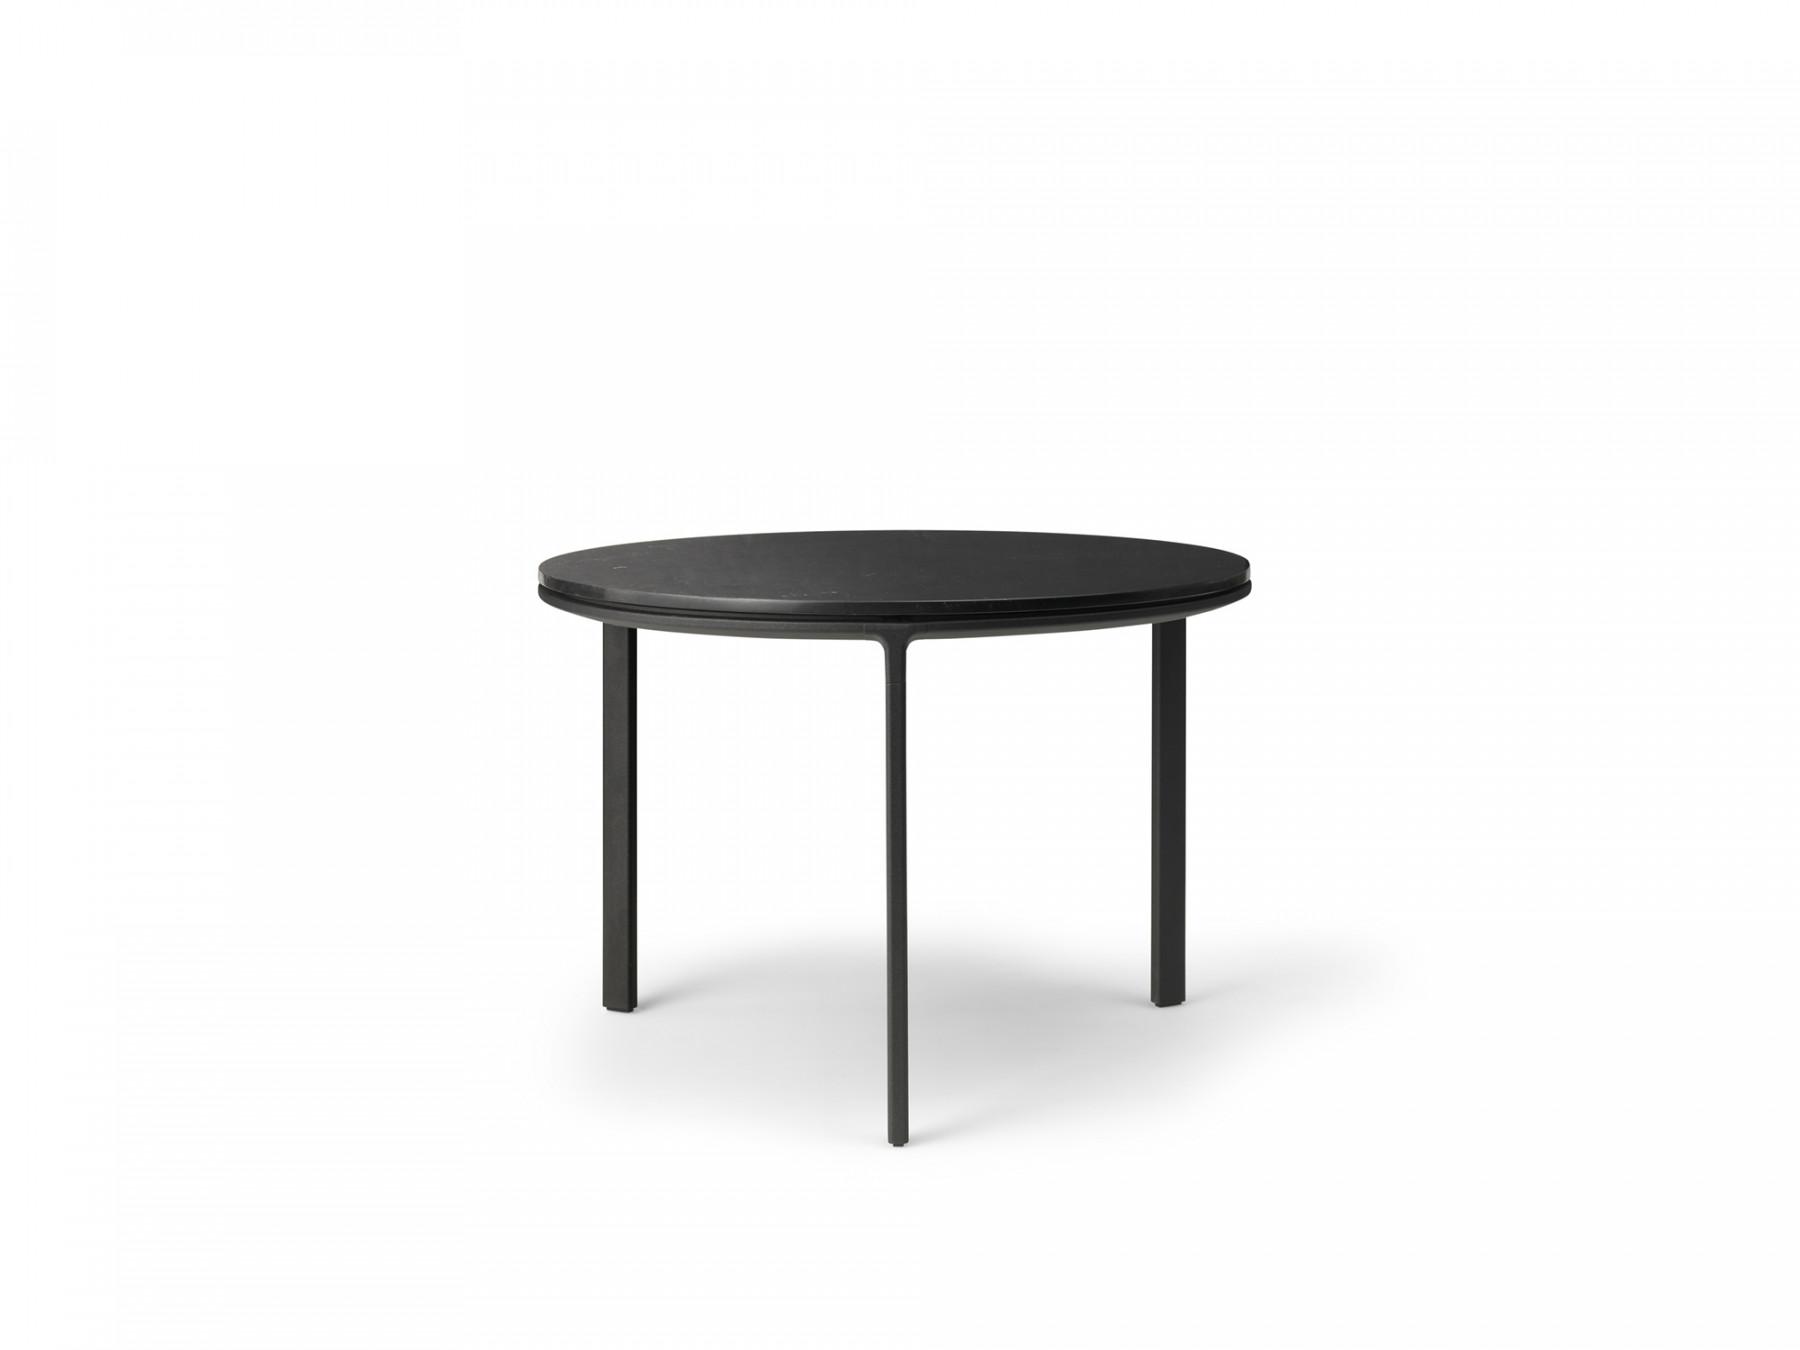 vipp Coffee Table VIPP423, 42320, 5705953169051